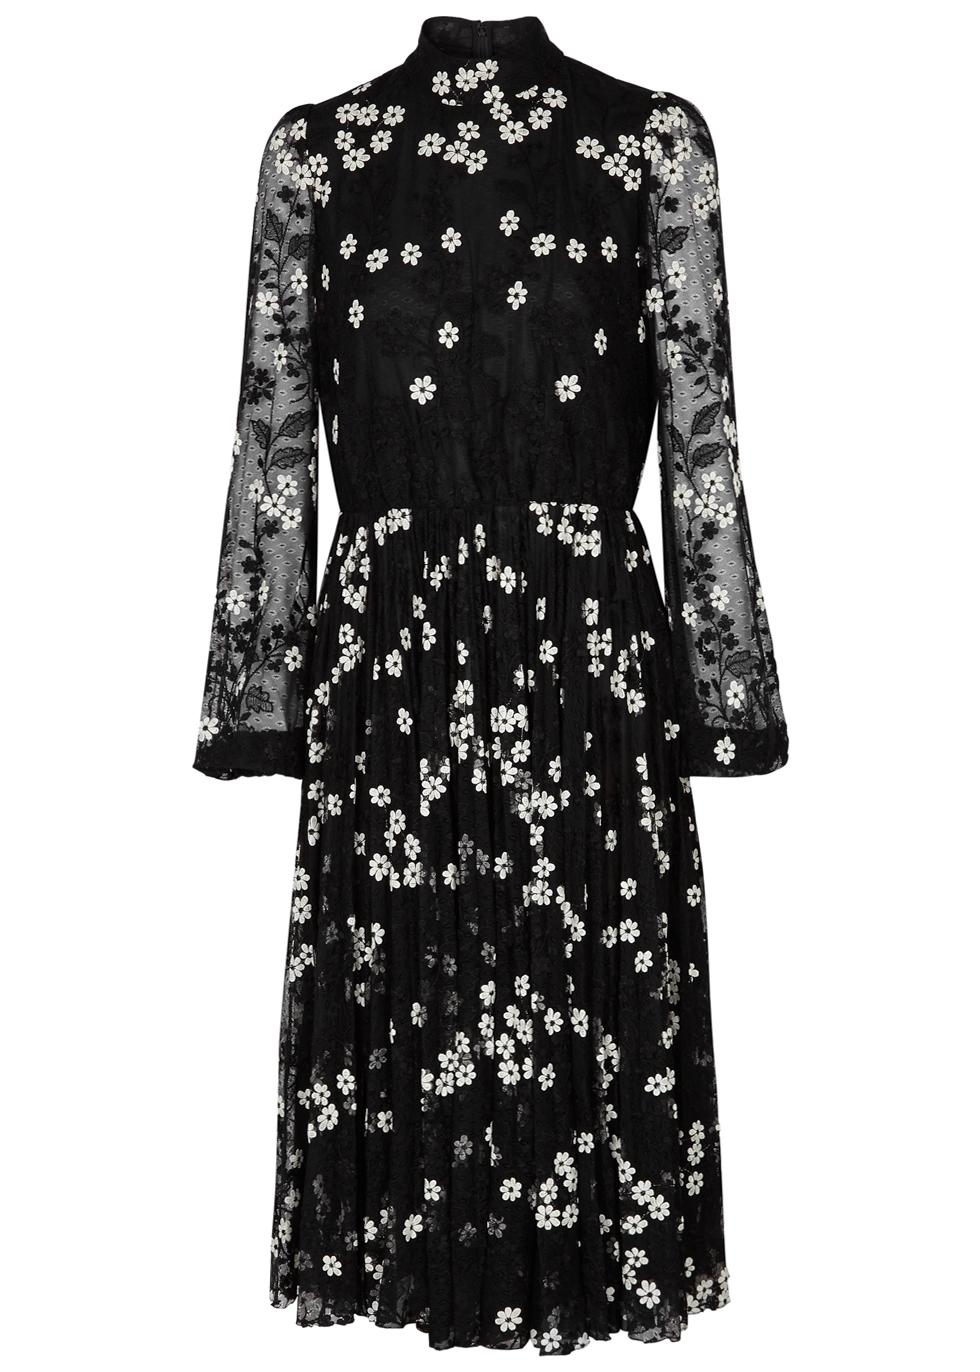 GIAMBATTISTA VALLI BLACK EMBROIDERED LACE DRESS